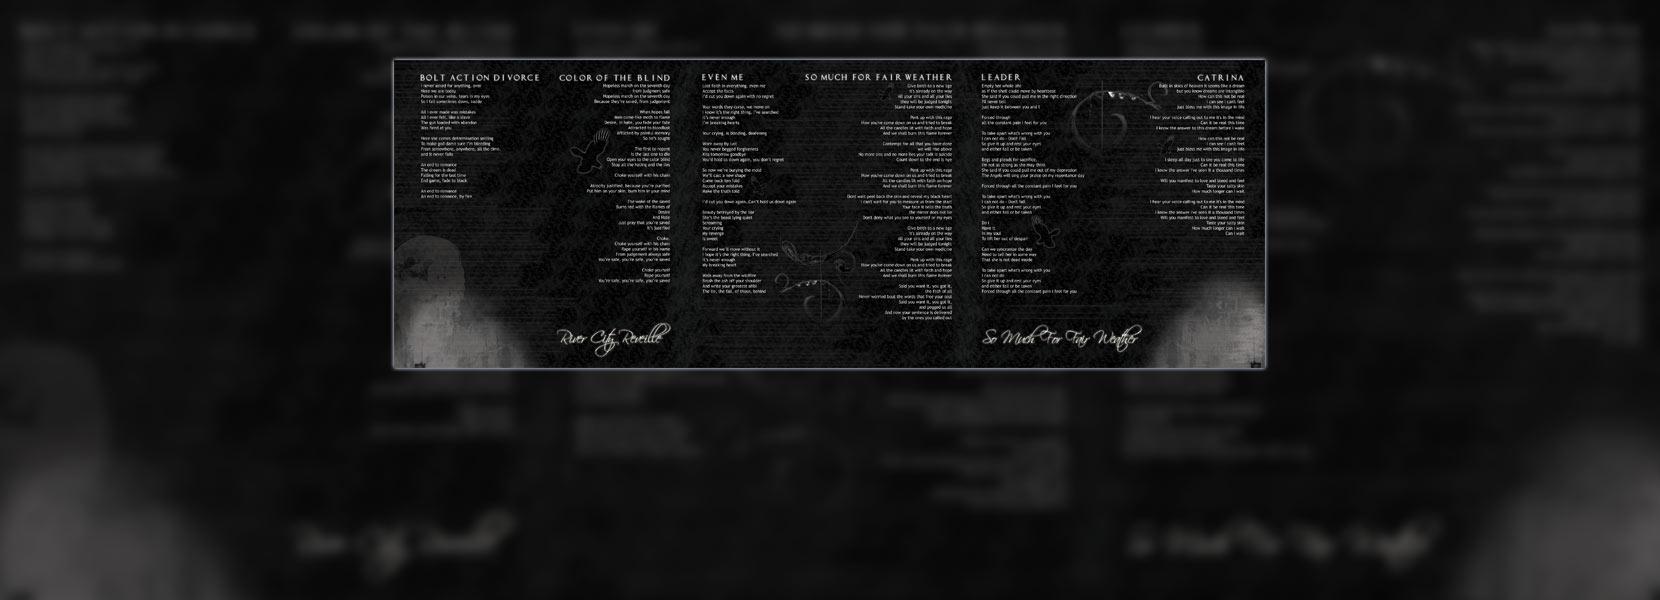 http://kamillamusic.com/wp-content/uploads/2014/11/River-City-Reveille-Inside1.jpg